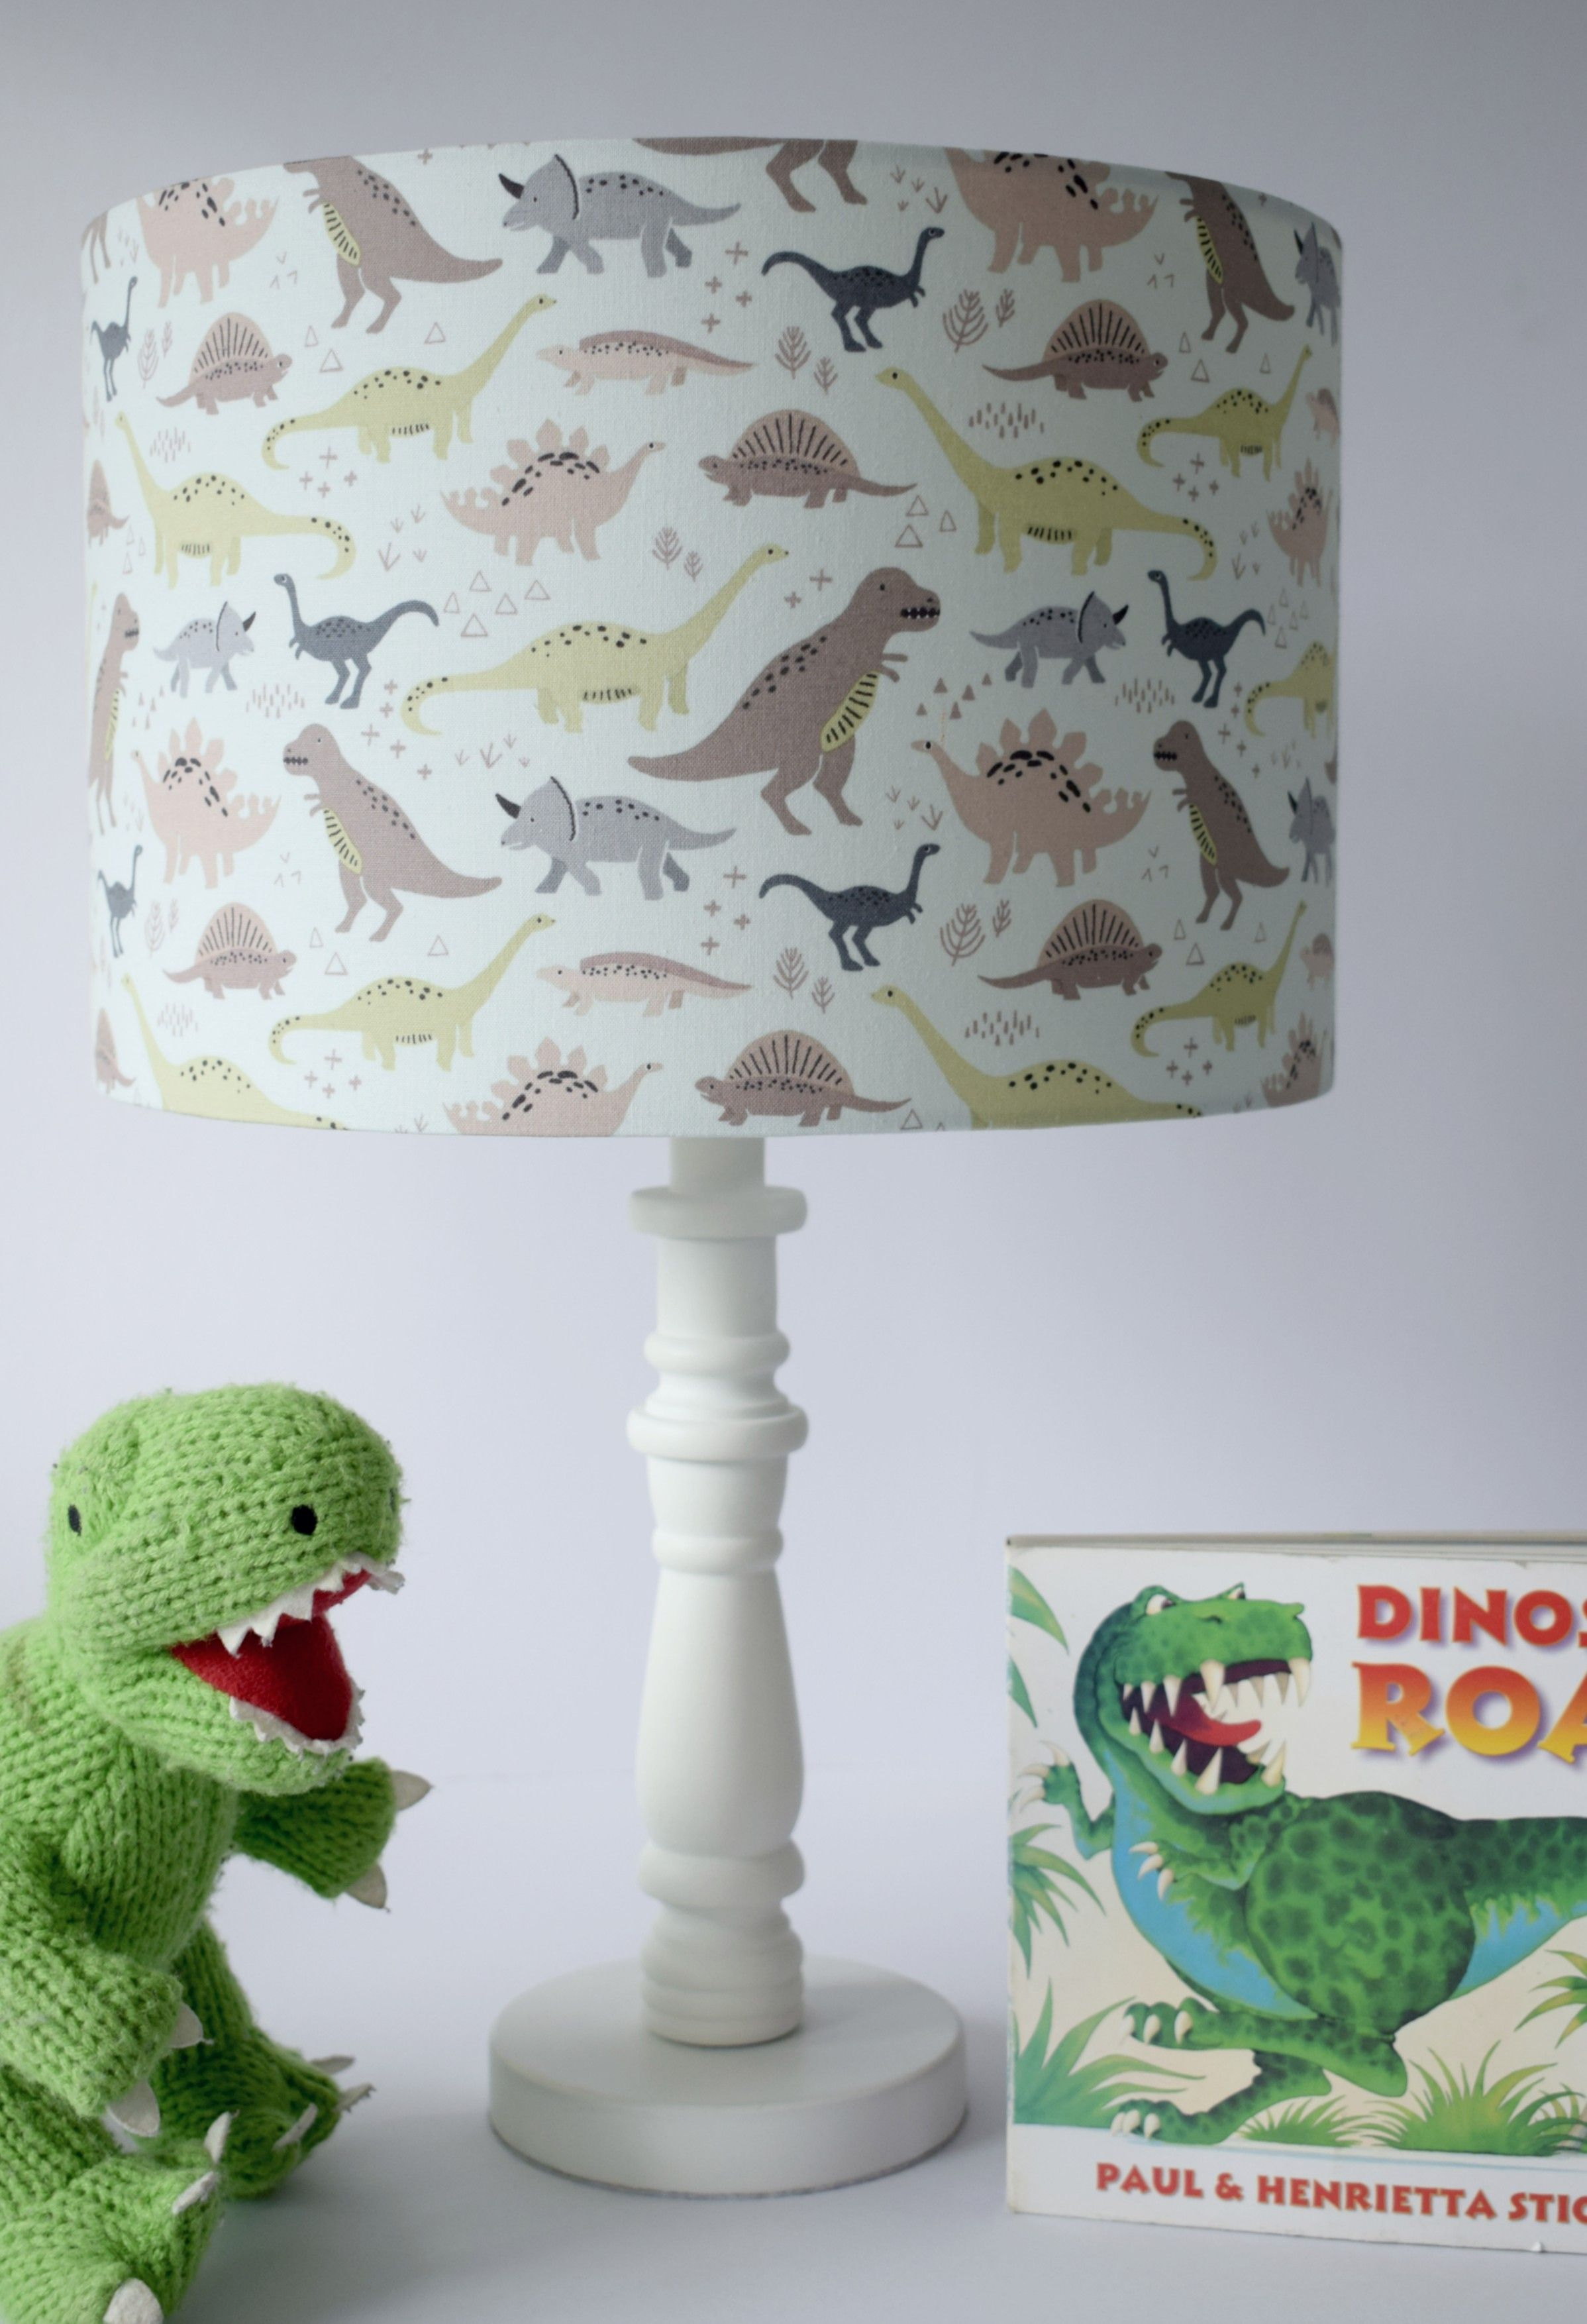 Dinosaur Lampshade Ceiling Blue Lampshade For Boys Dinosaur Nursery Decor Dinosaur Home Decor Gift Dinosaur Bedroom Accessories Camerette